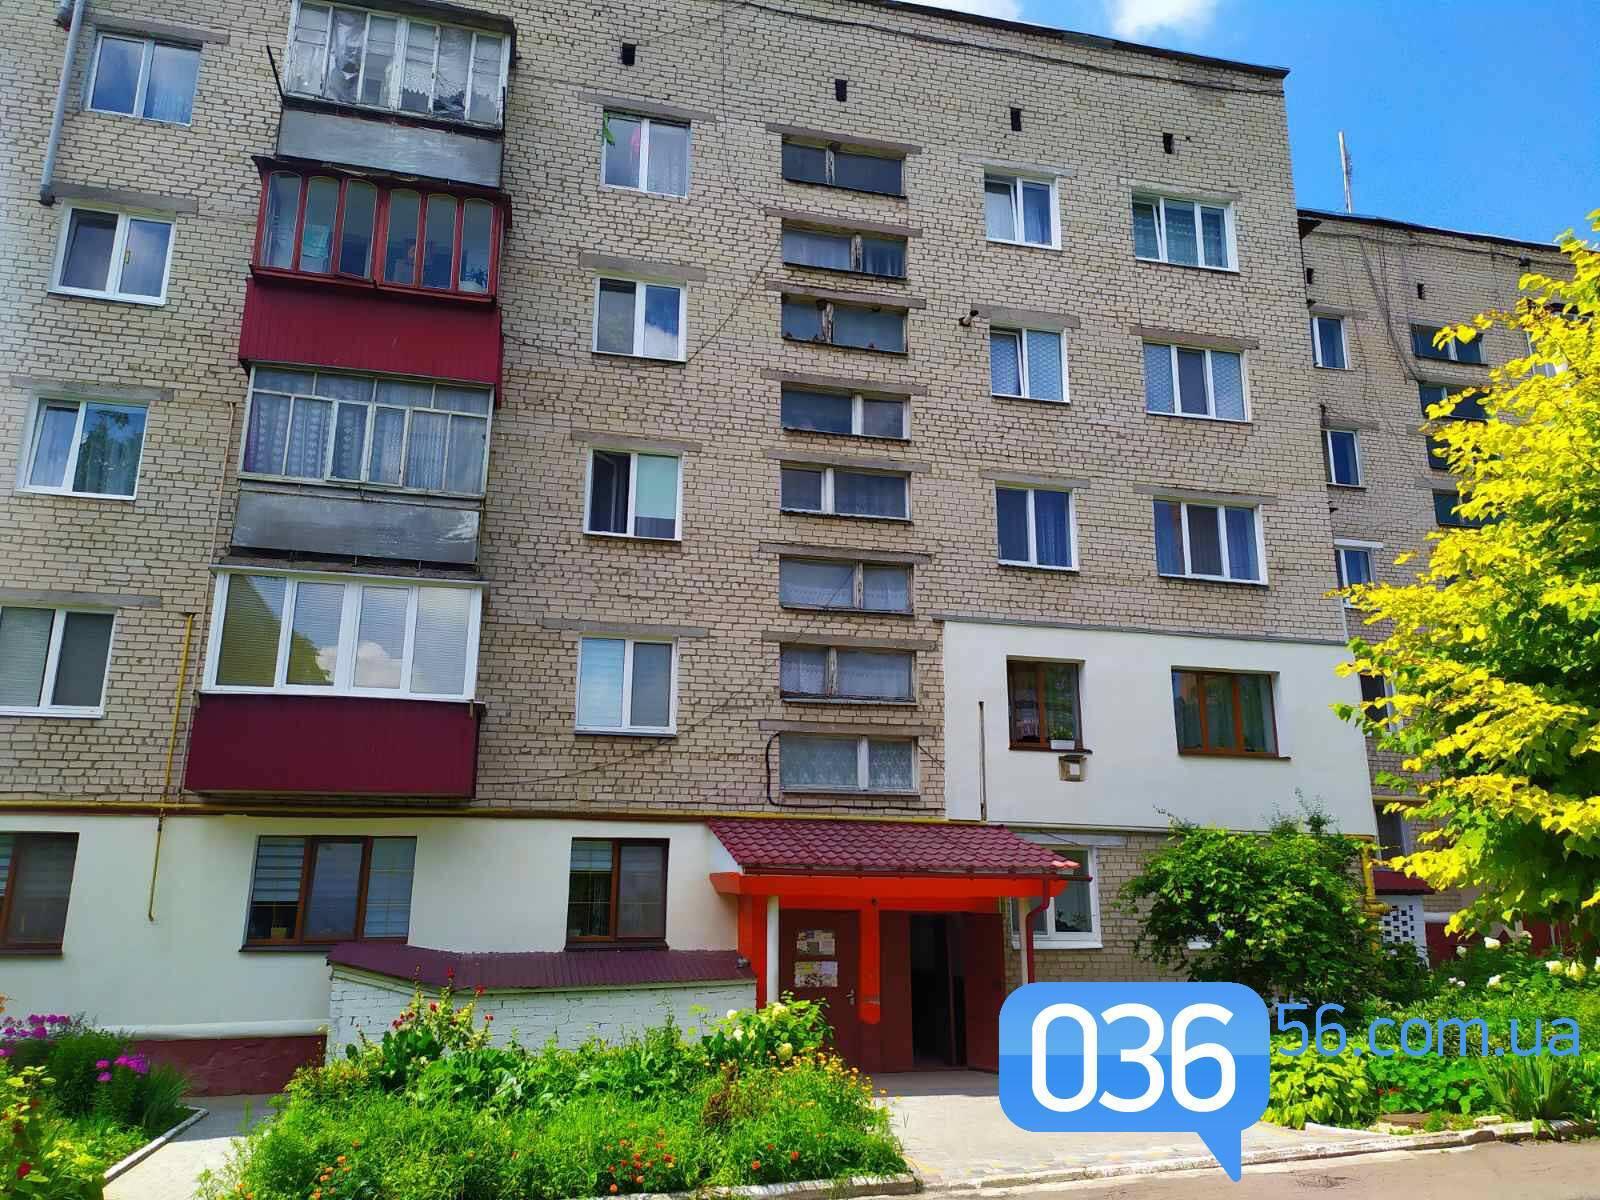 Дом в Дубно, где живет Максим Кривош